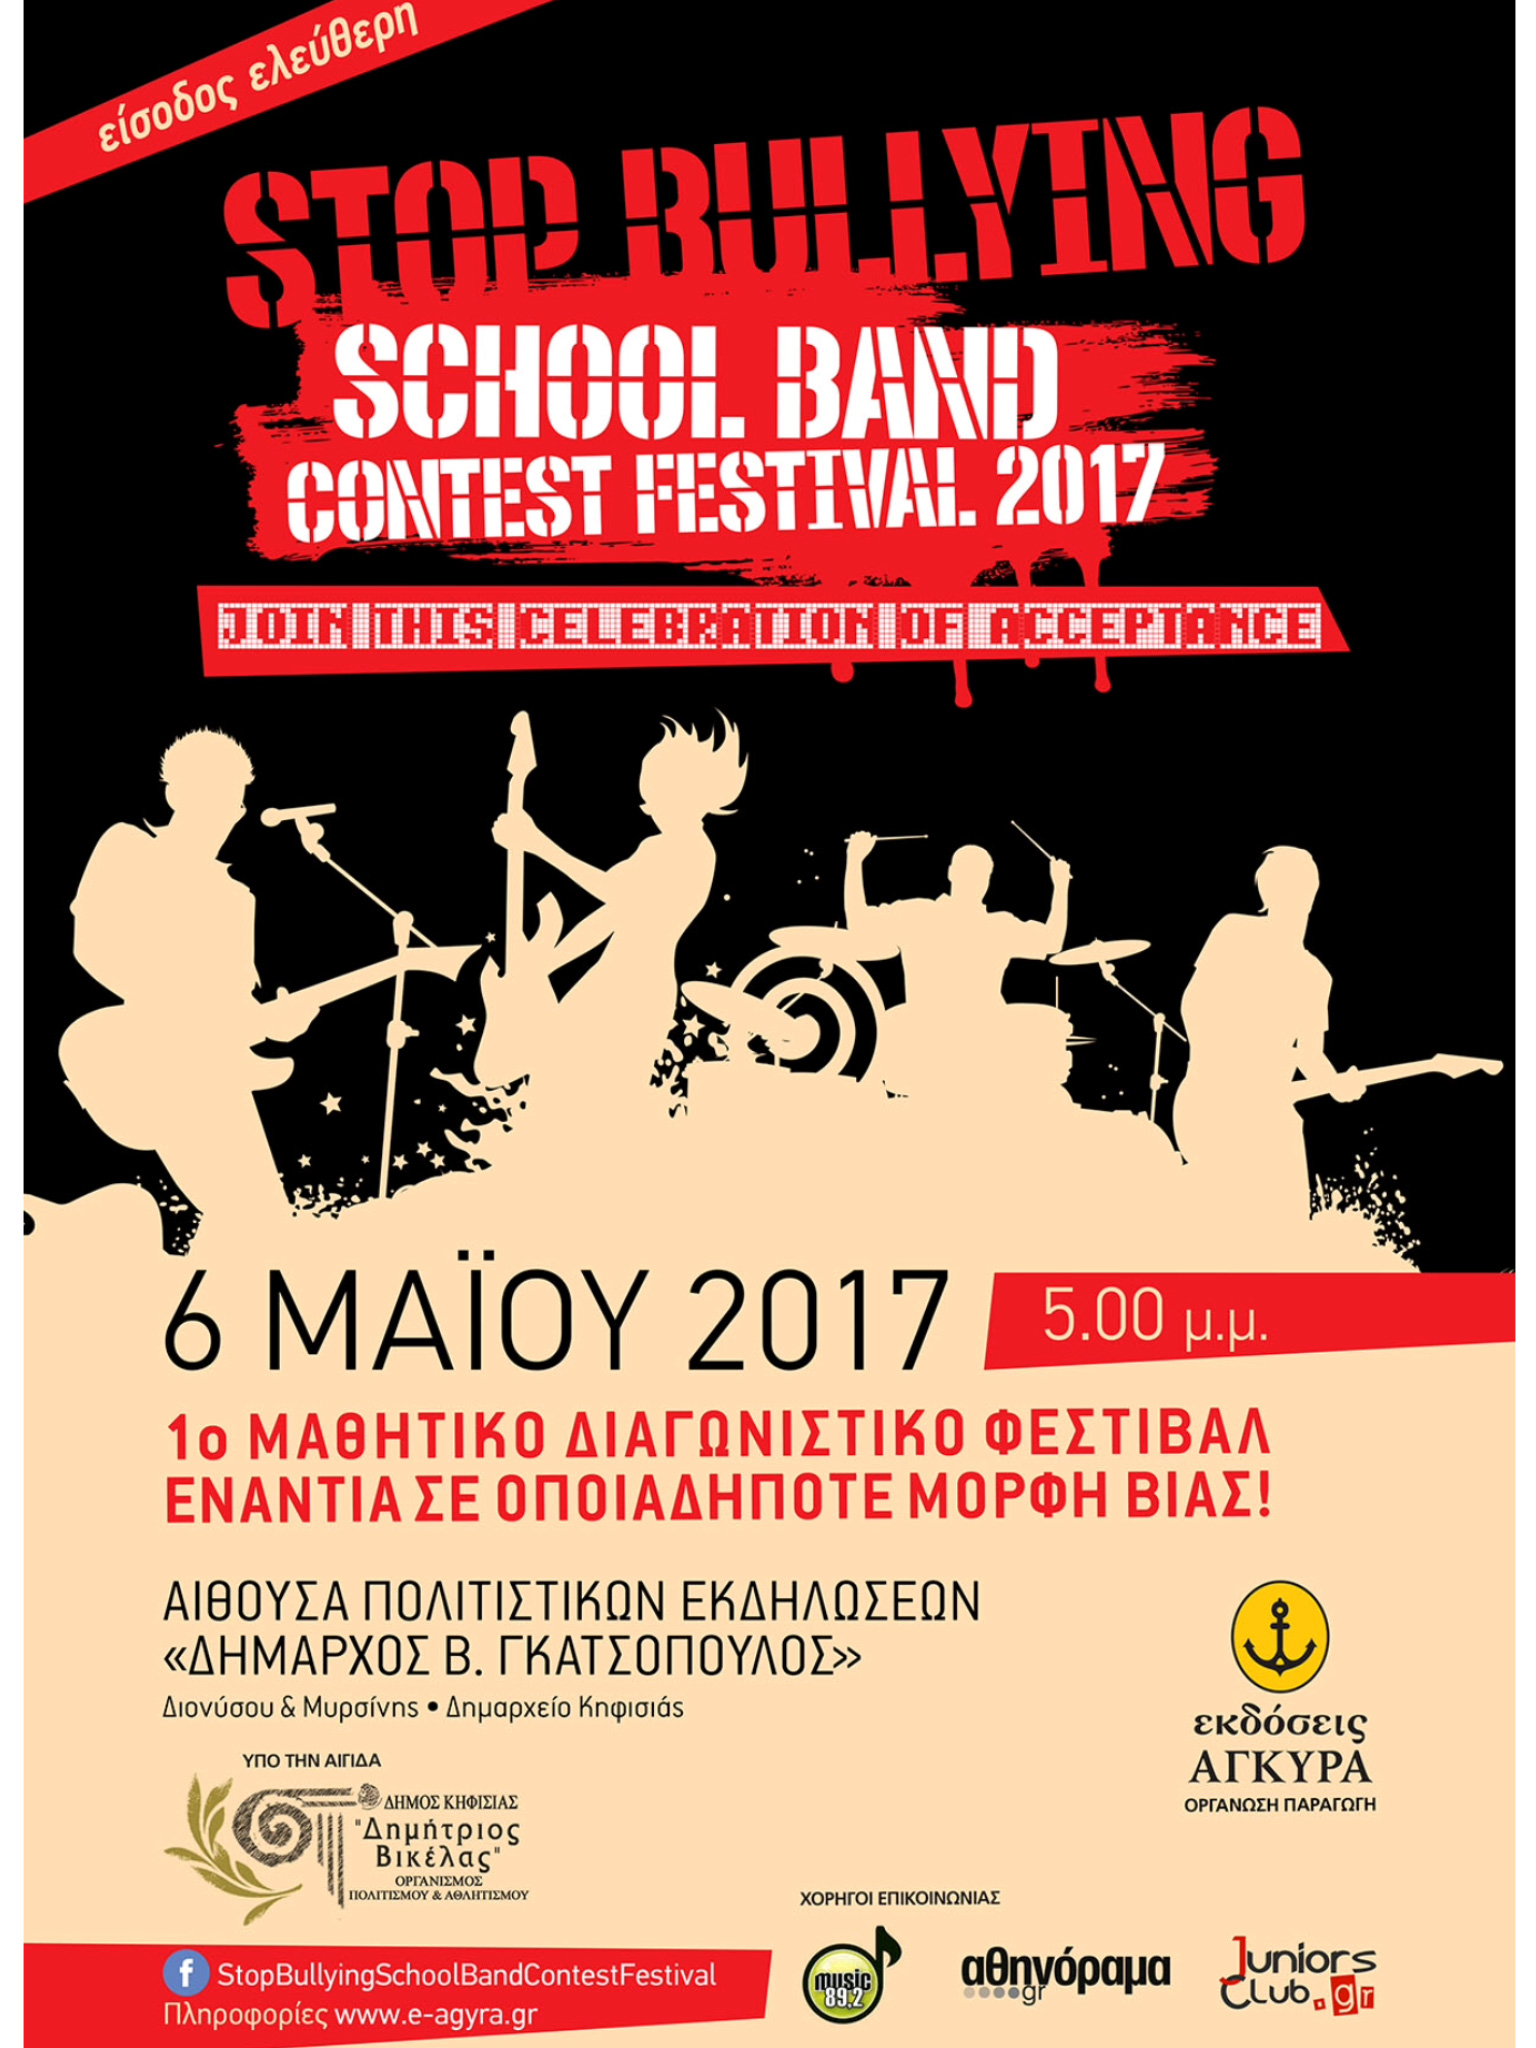 1st SCHOOL BAND CONTEST FESTIVAL